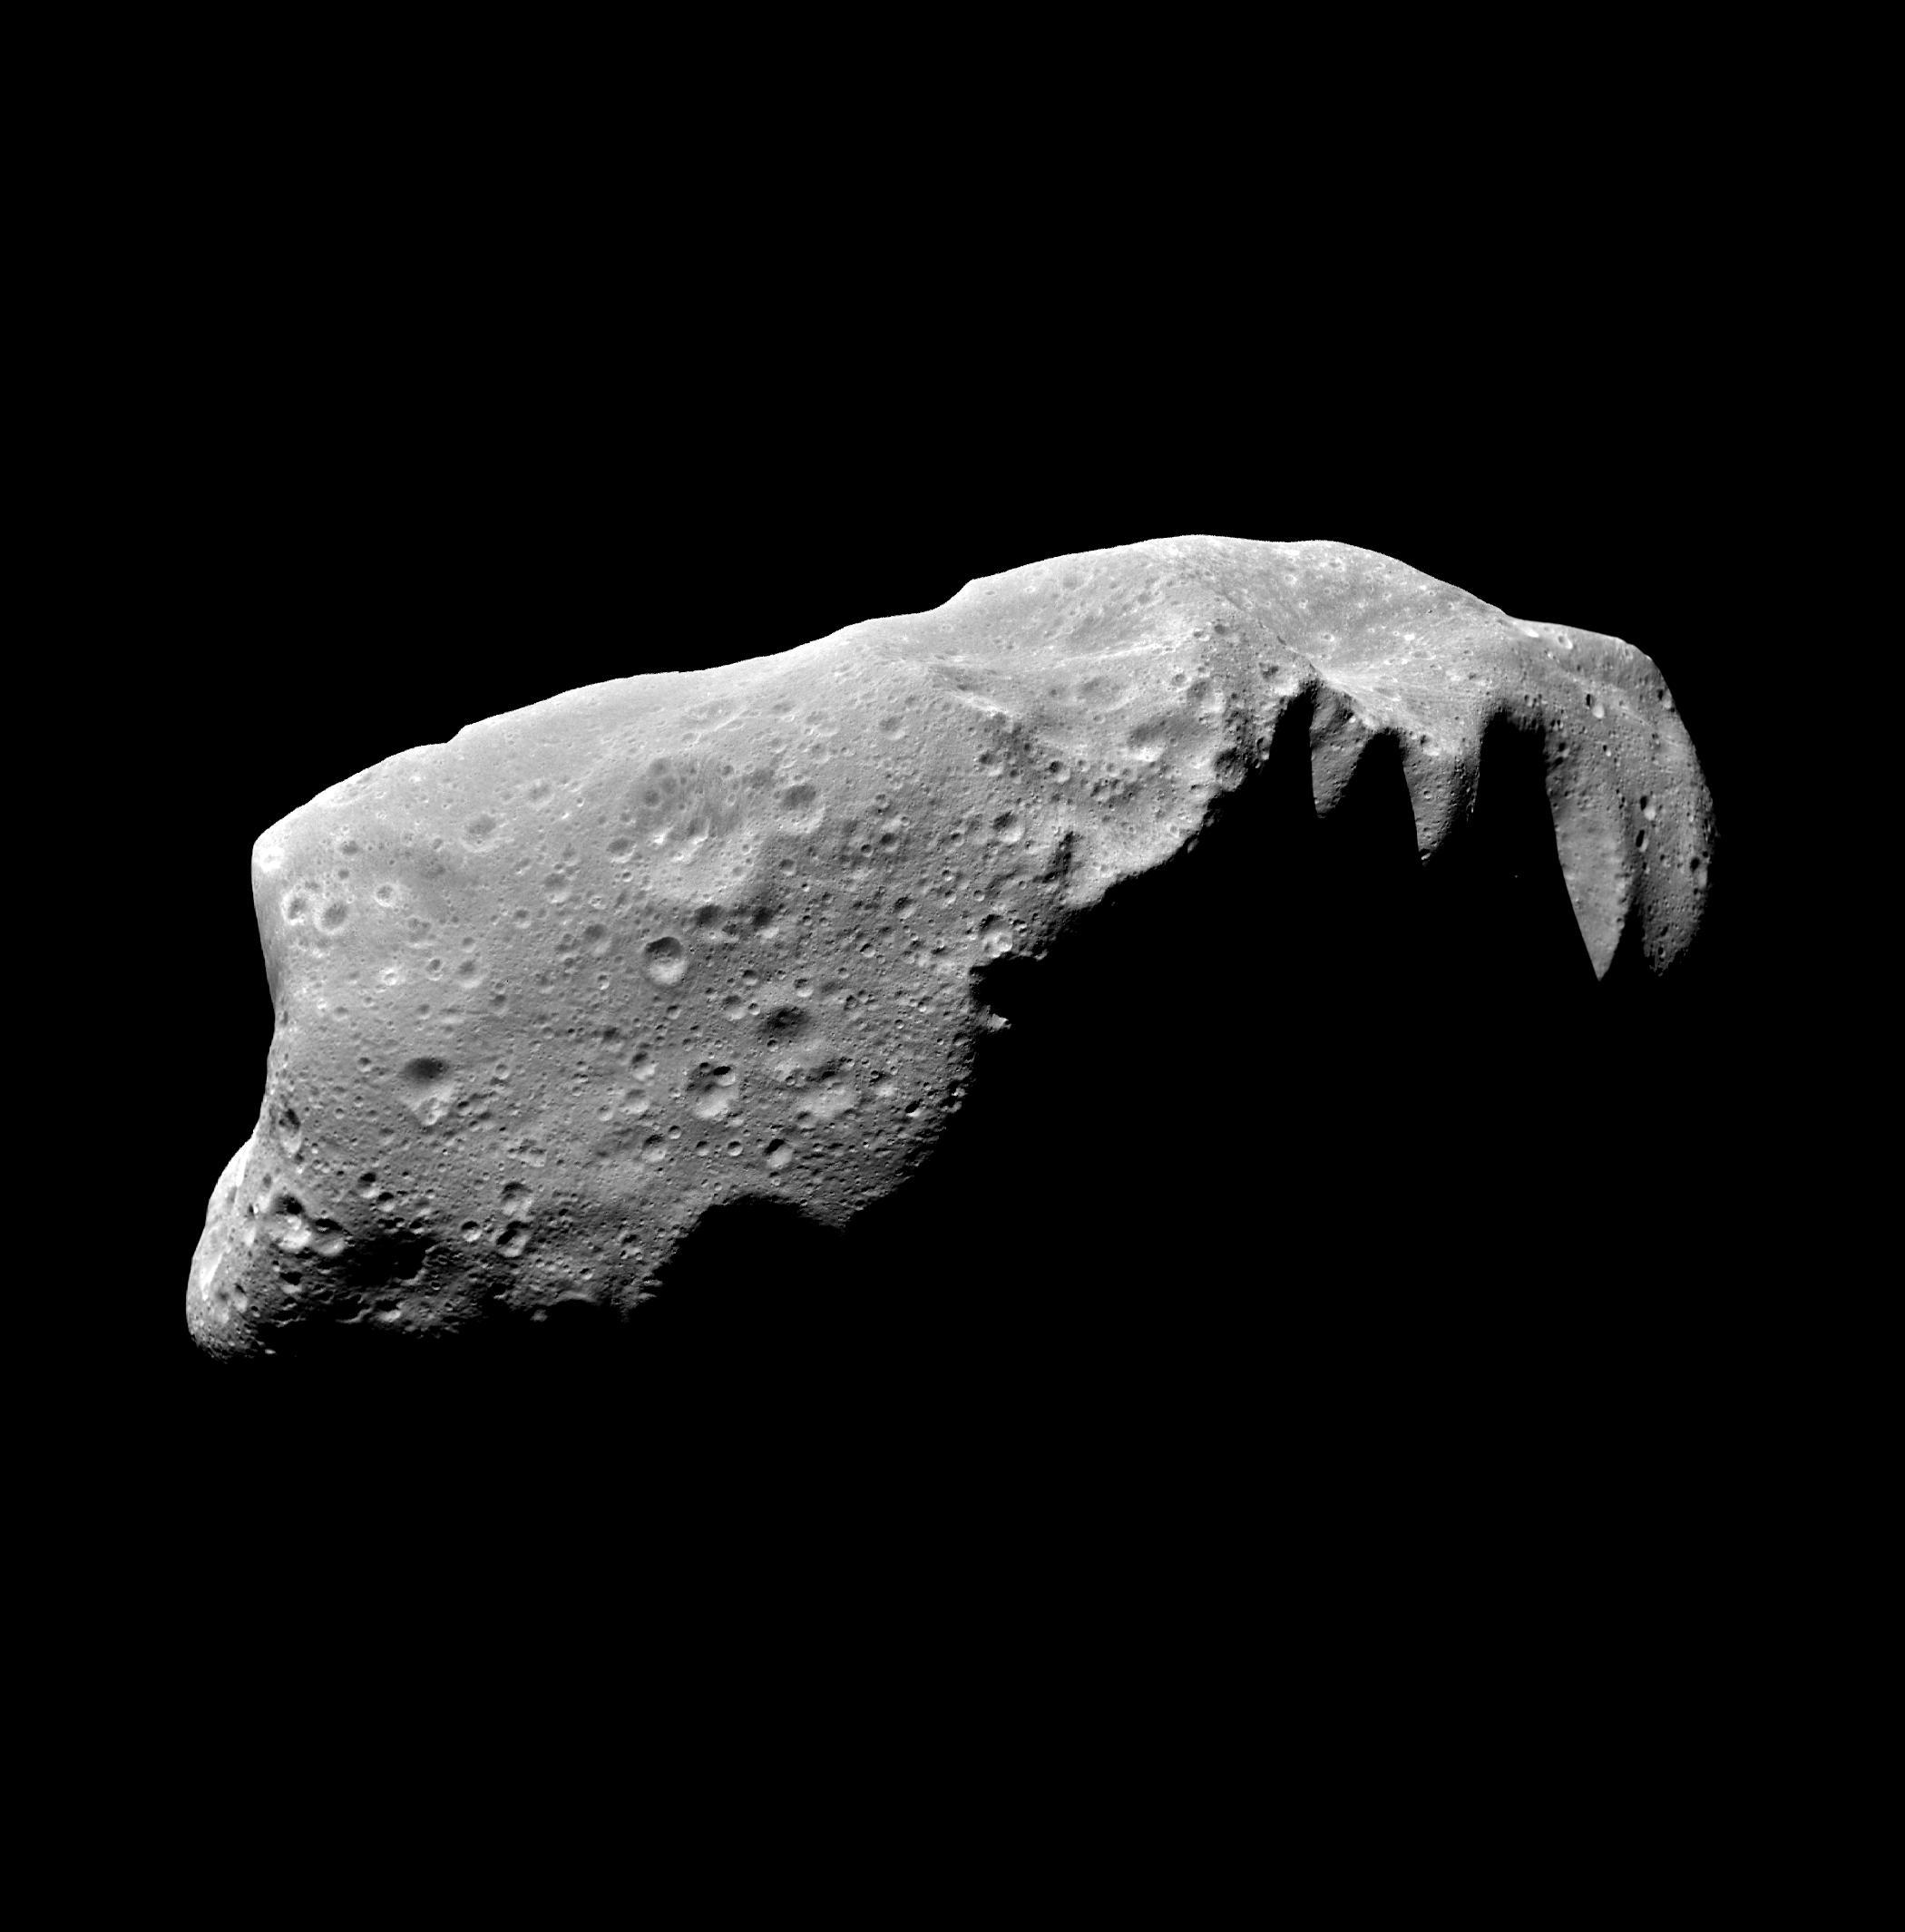 asteroids rocky - photo #24